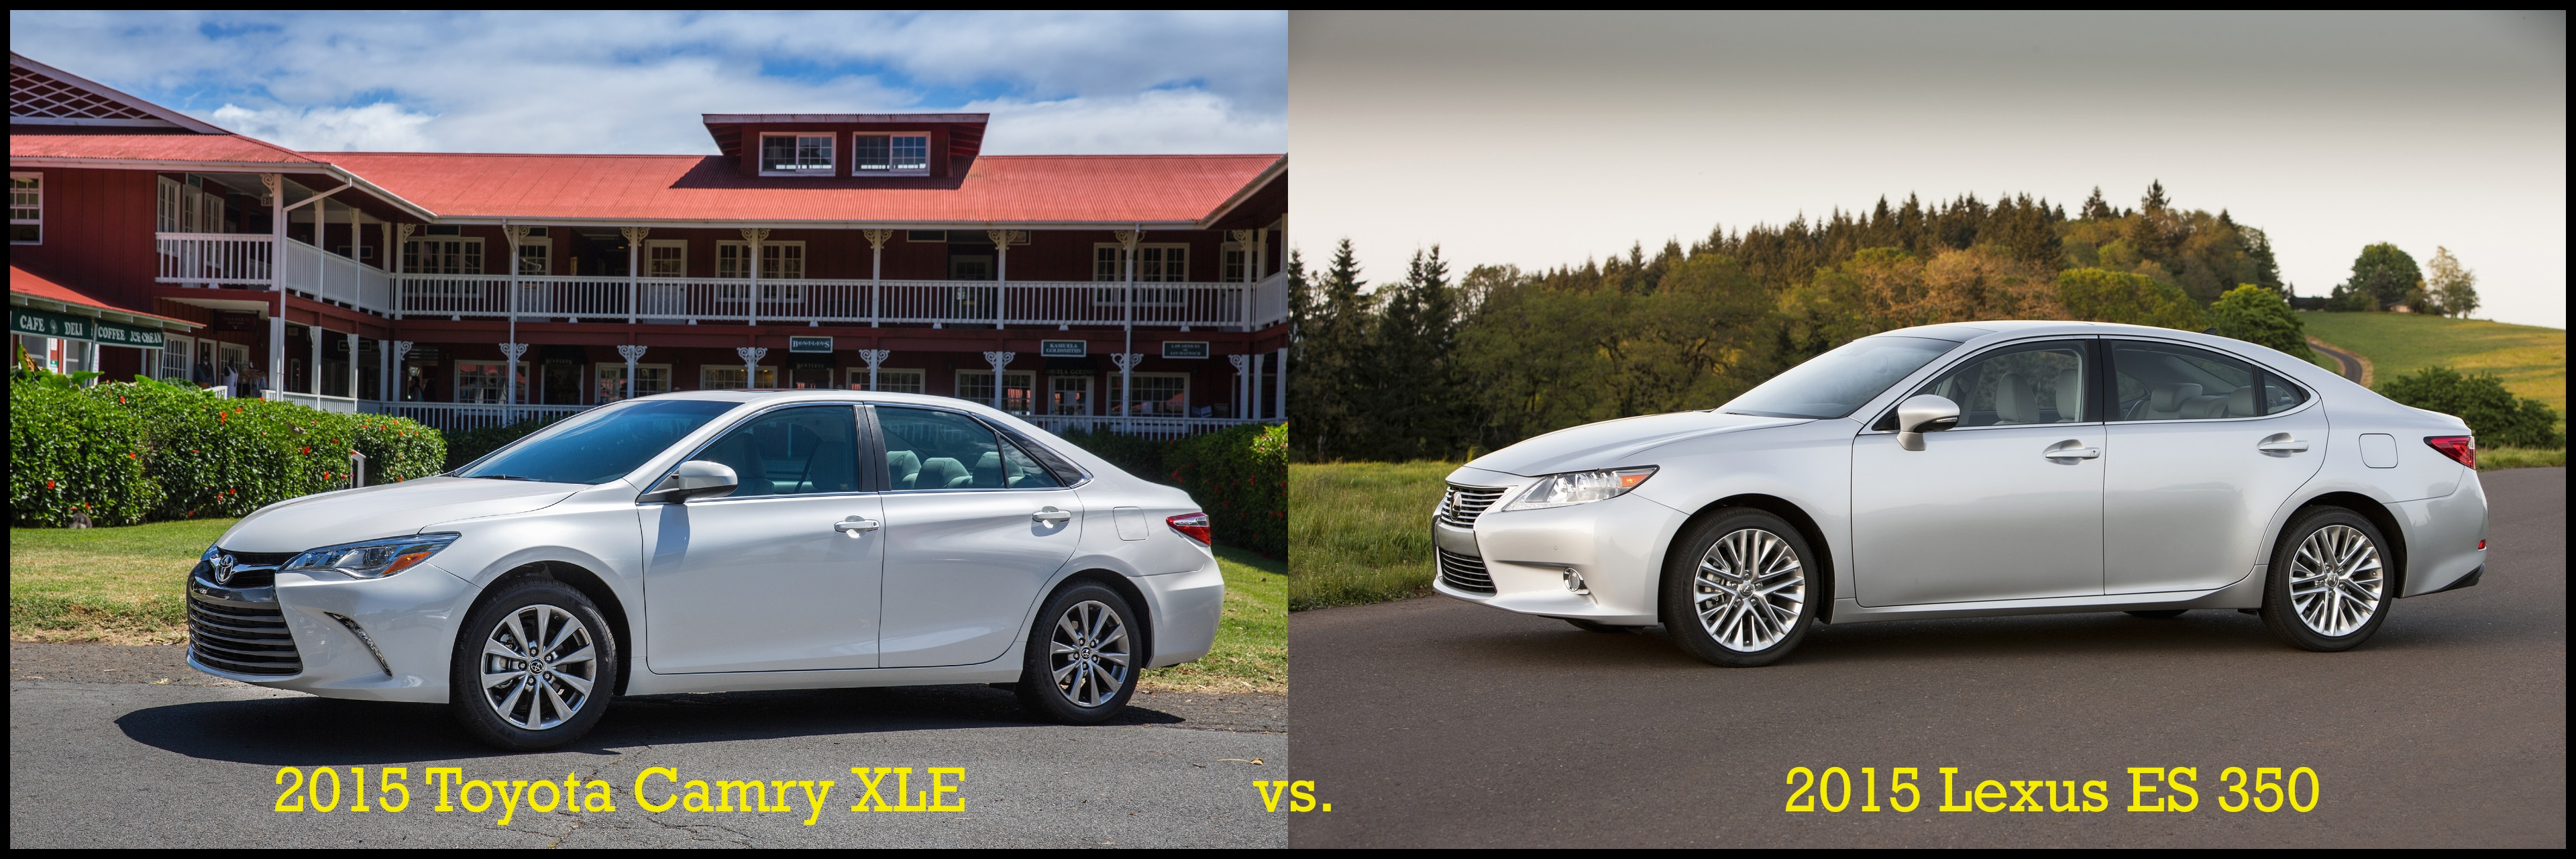 2015 Toyota Camry XLE vs 2015 Lexus ES 350